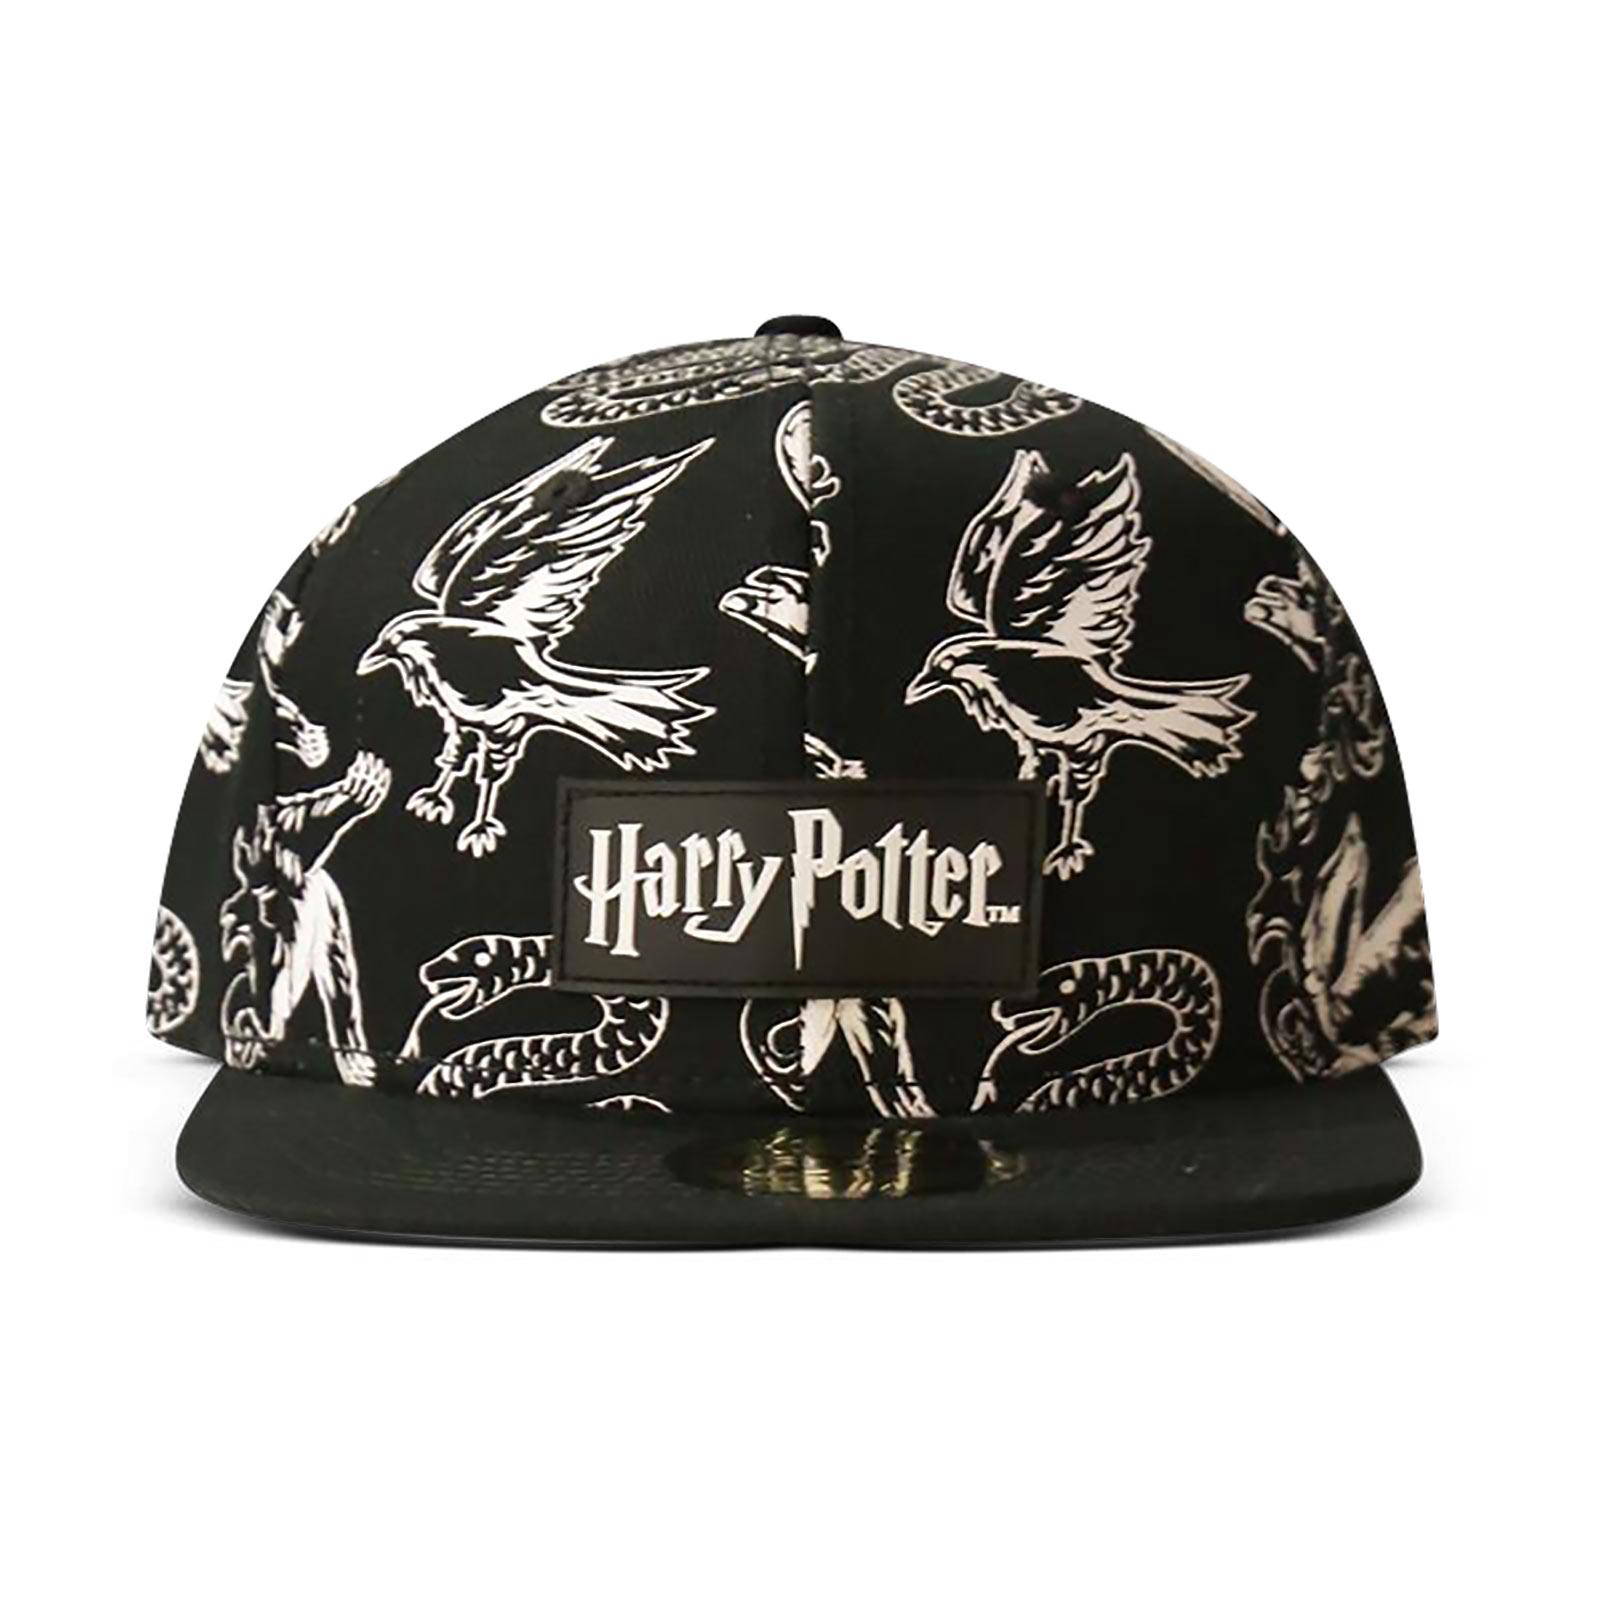 Harry Potter - Hogwarts Wappentiere Snapback Cap schwarz-weiß